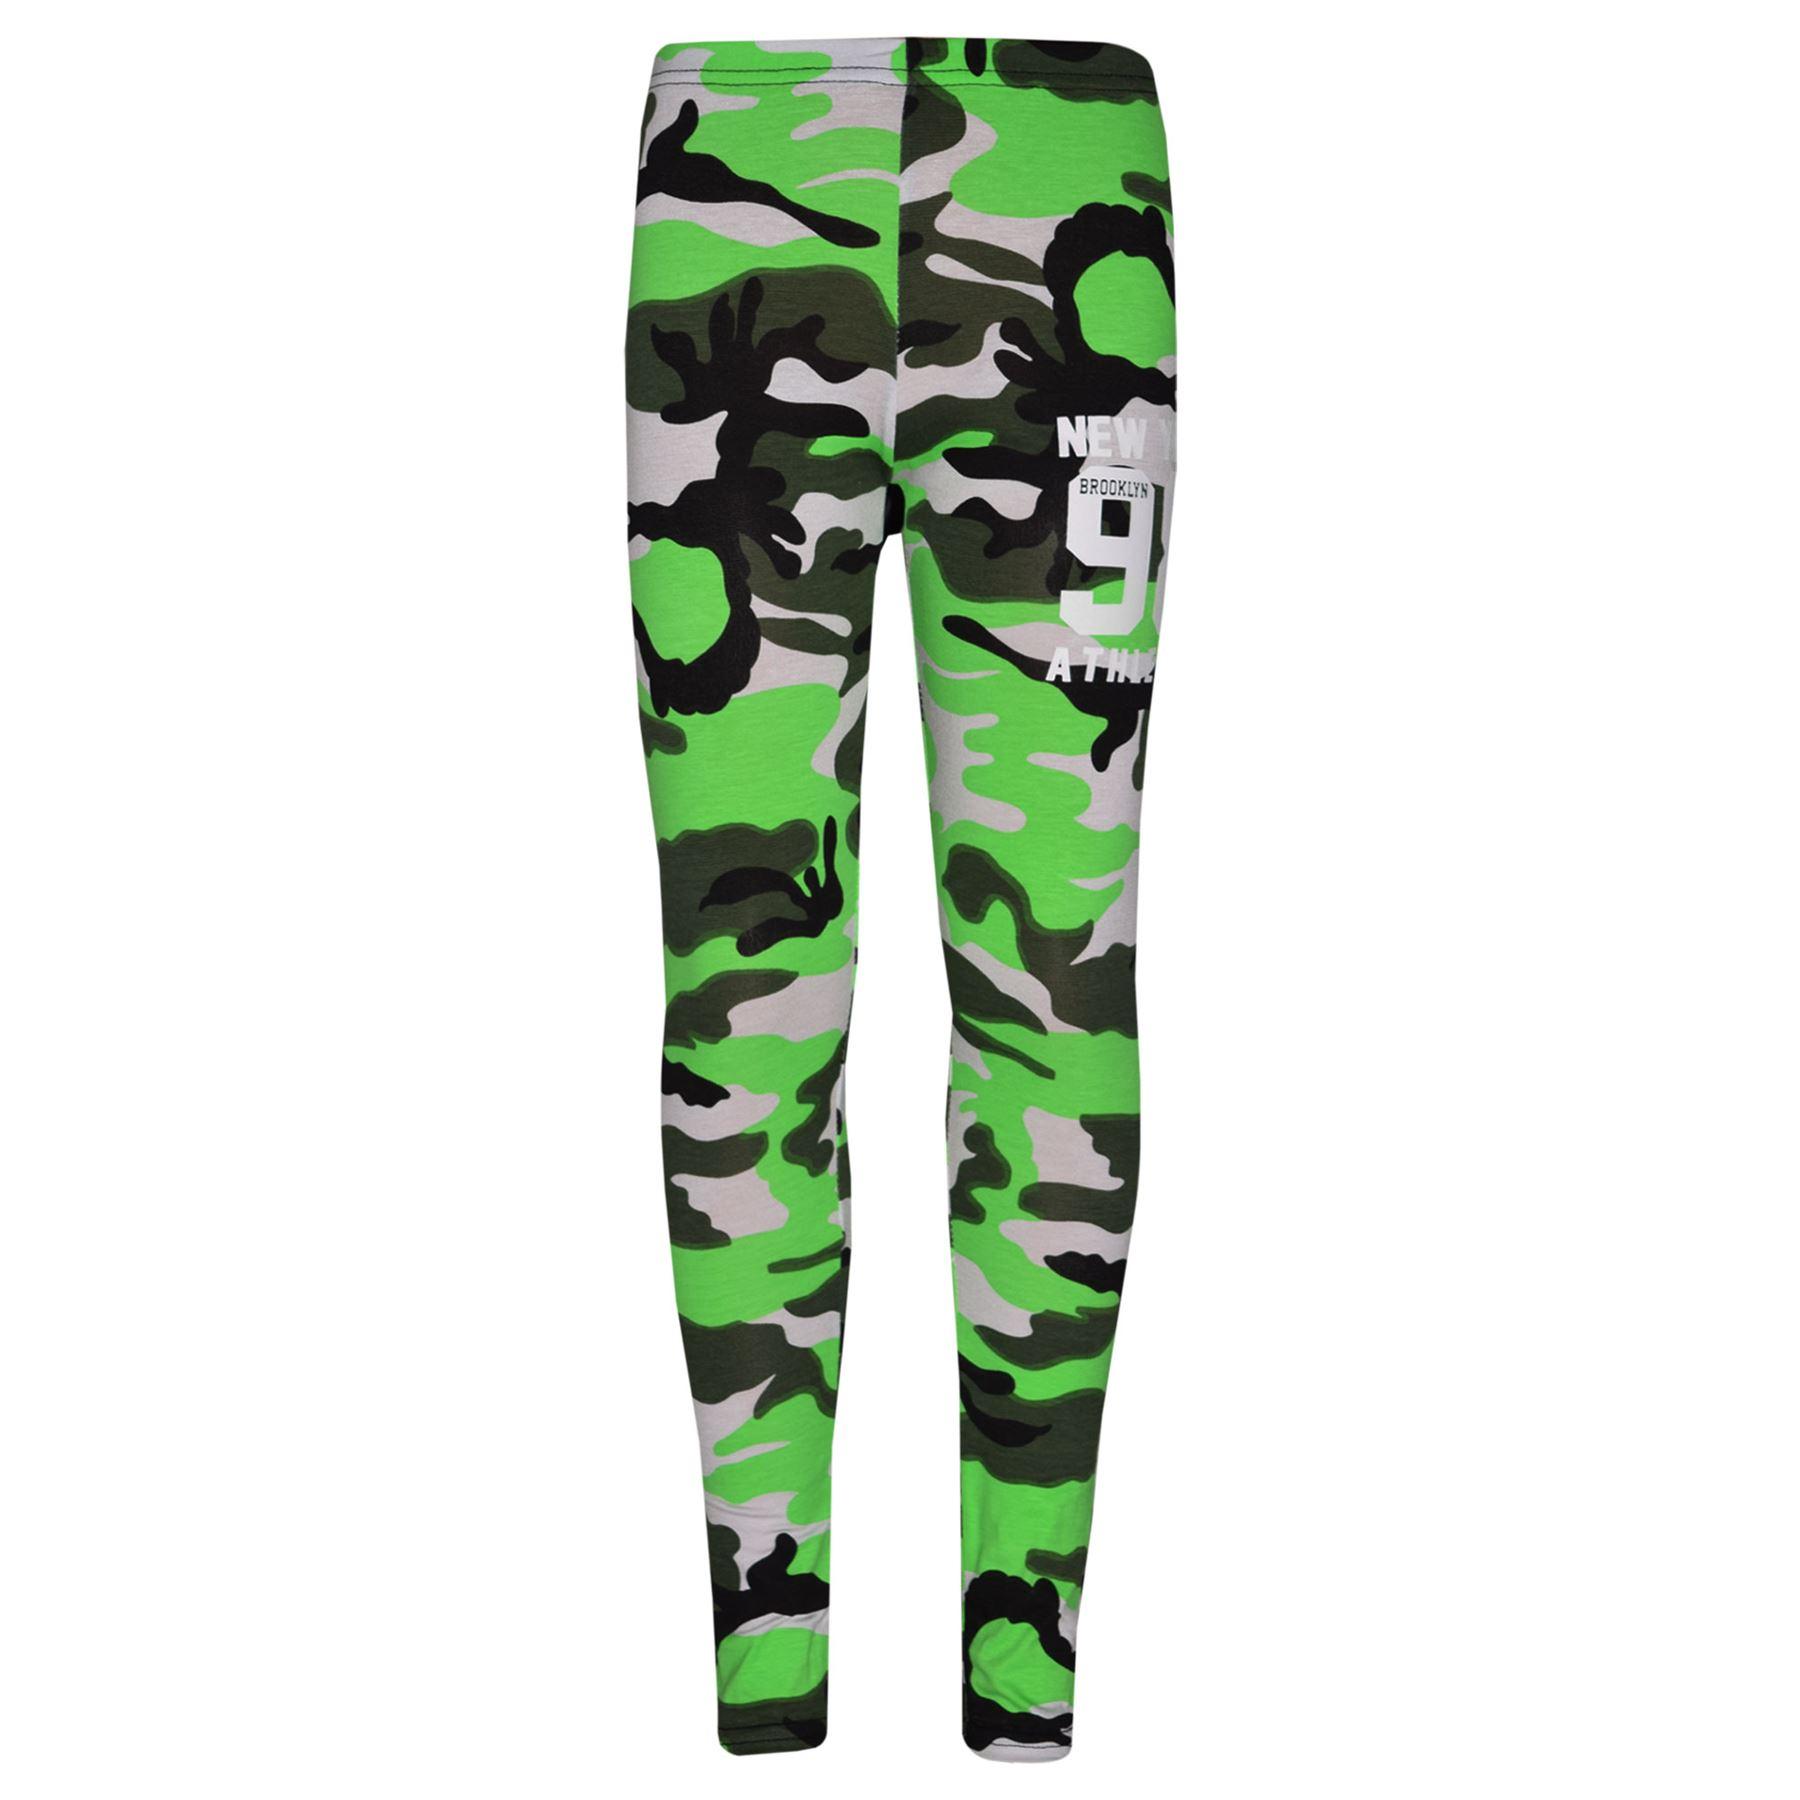 Girls-NEW-YORK-BROOKLYN-98-ATHLECTIC-Camouflage-Print-Top-amp-Legging-Set-7-13-Yr thumbnail 29